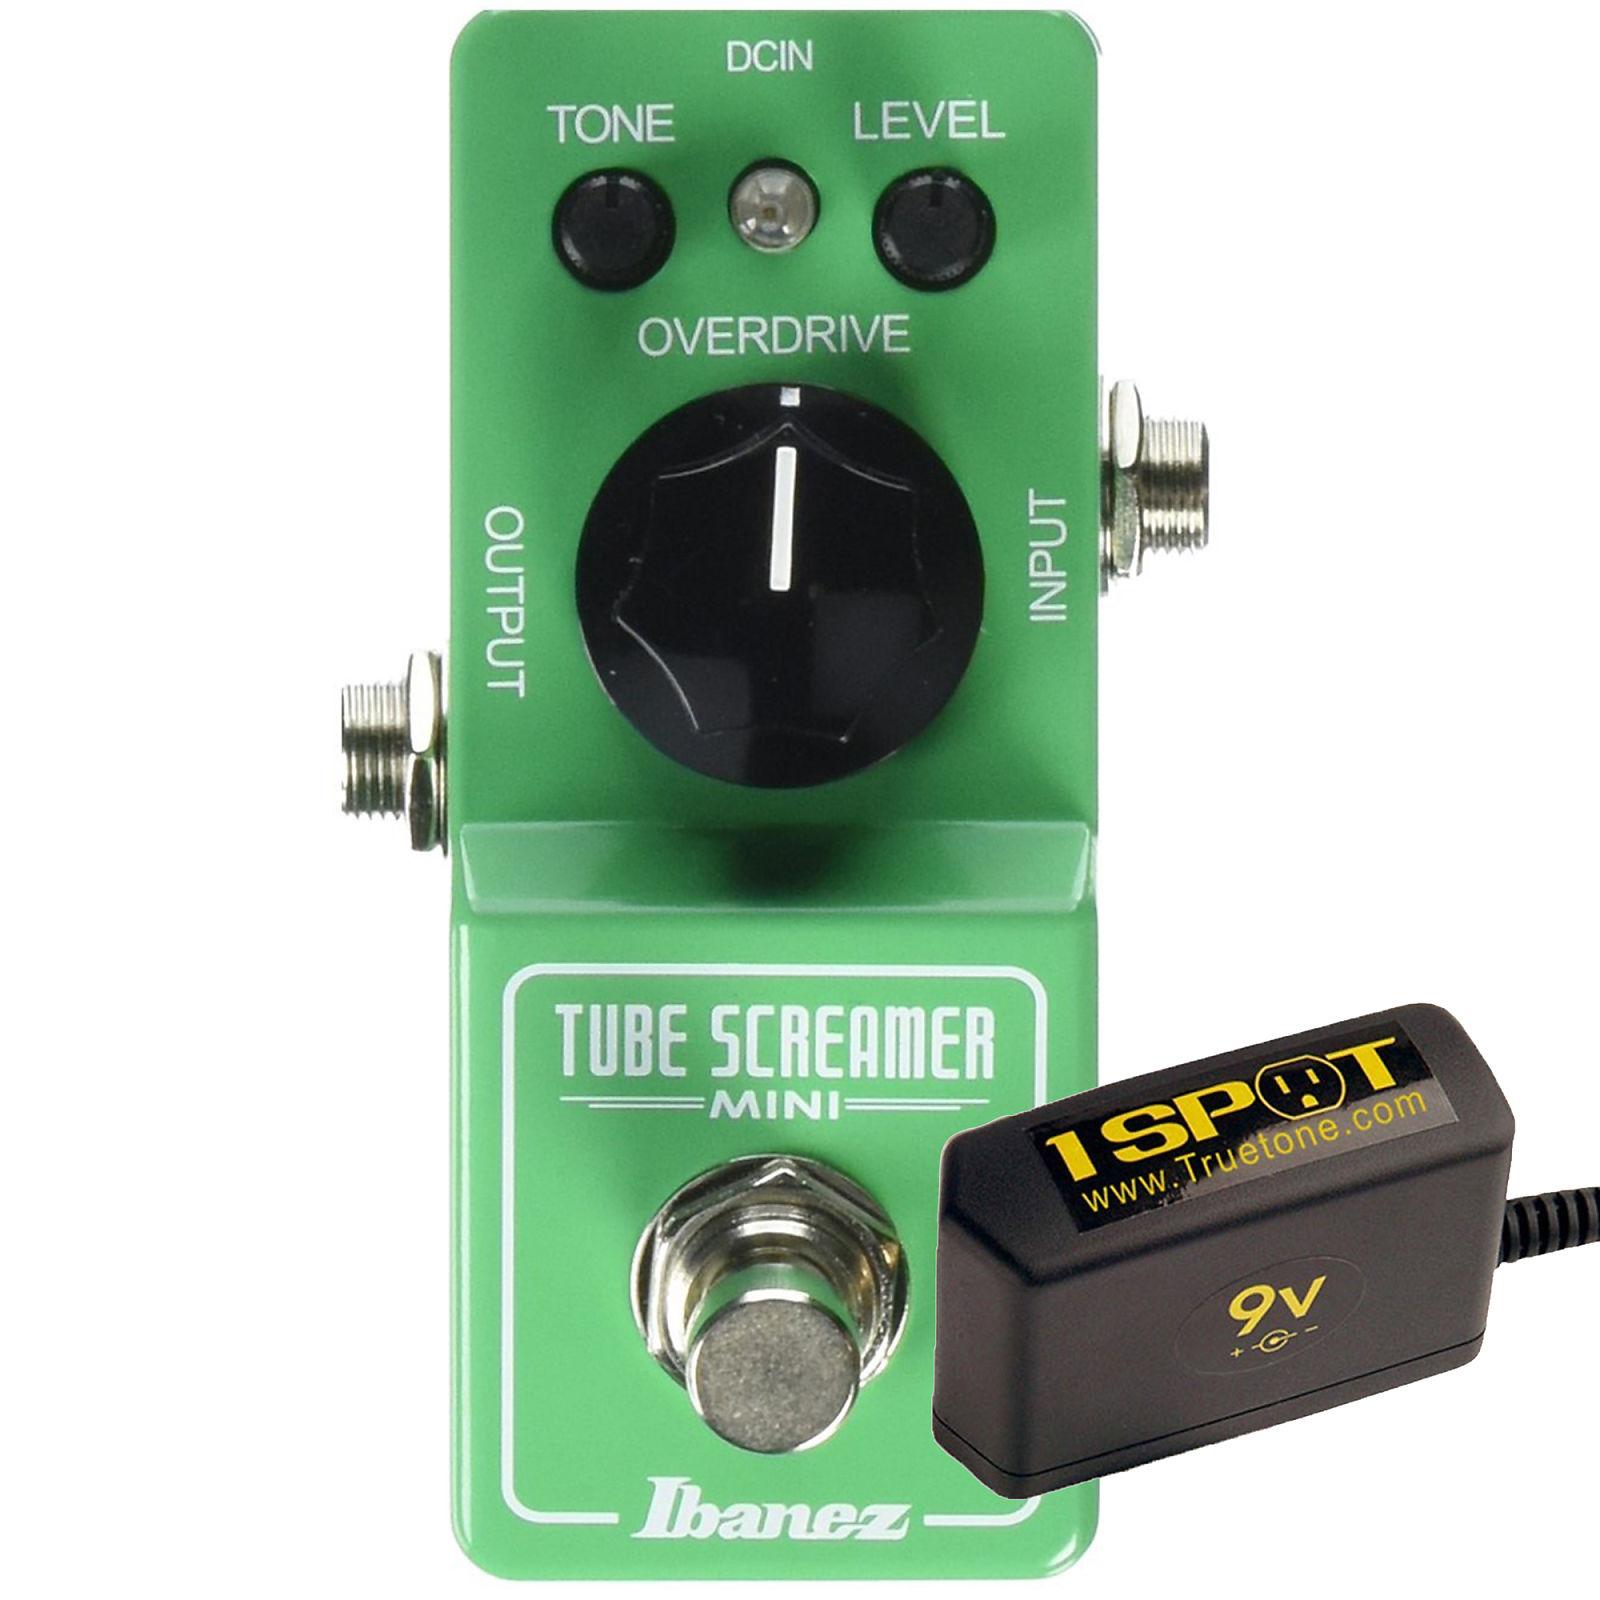 Ibanez Tube Screamer Mini Bundle w/ Truetone 1 Spot Space Saving 9v Adapter